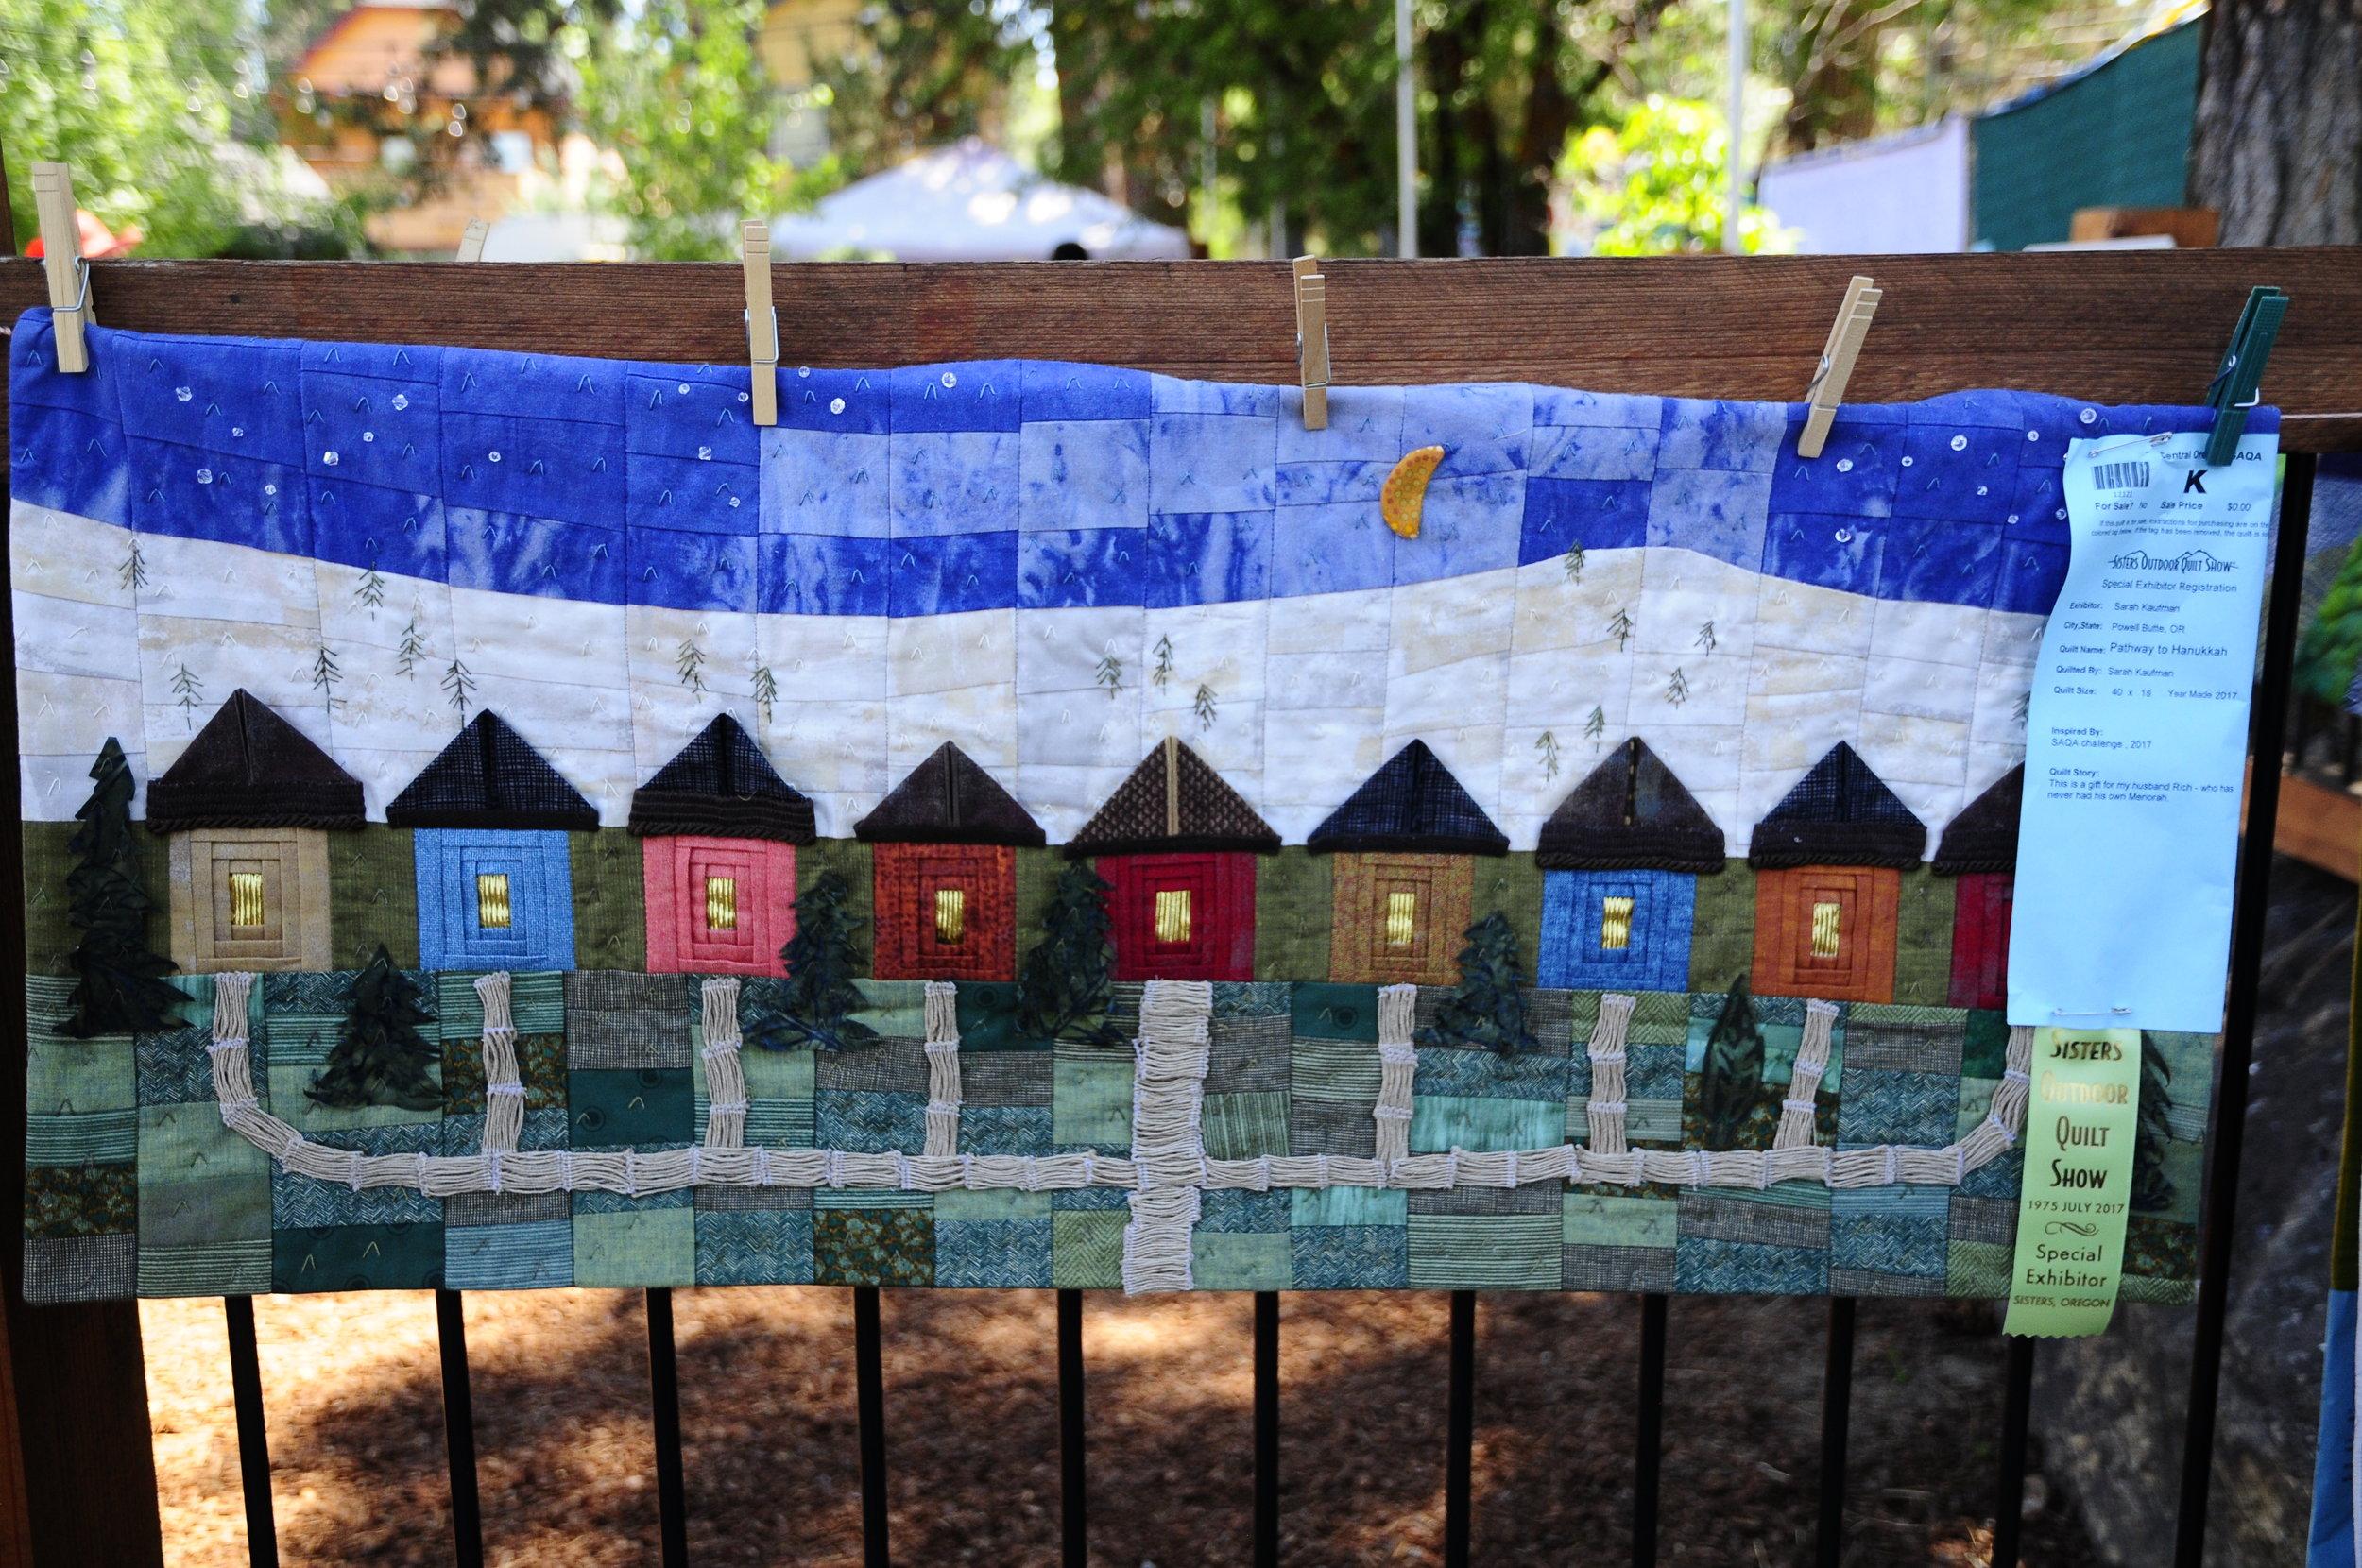 Pathway to Hanukkah by Sarah Kaufman